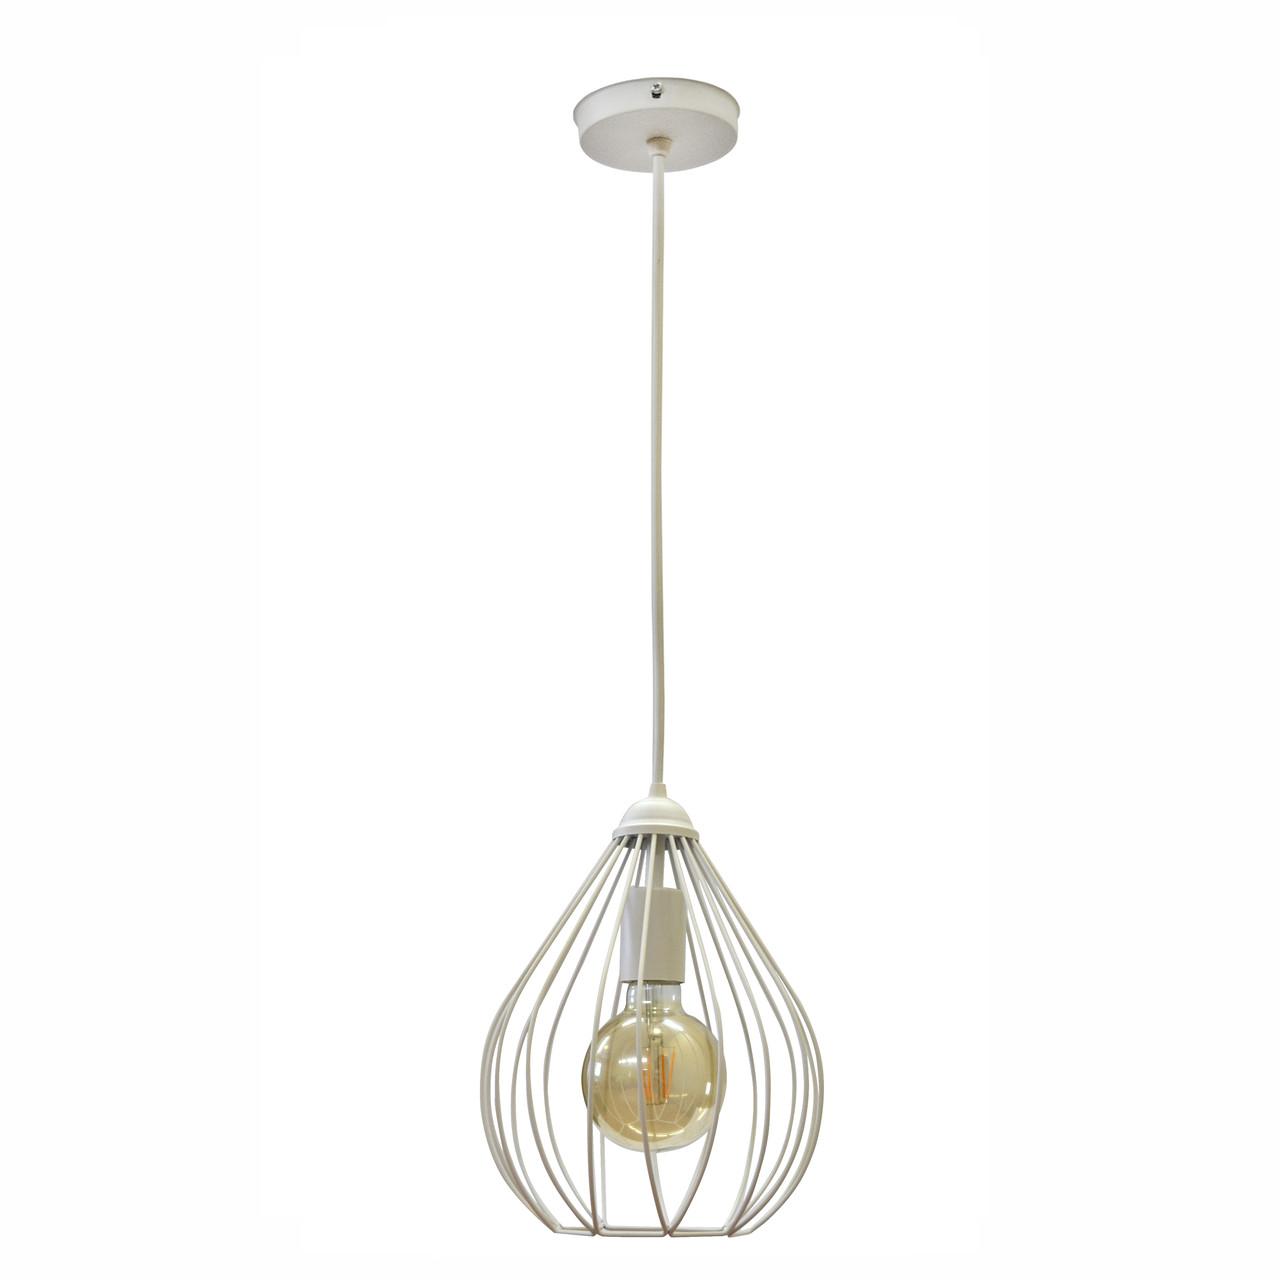 Светильник подвесной в стиле лофт NL 2229 W MSK Electric